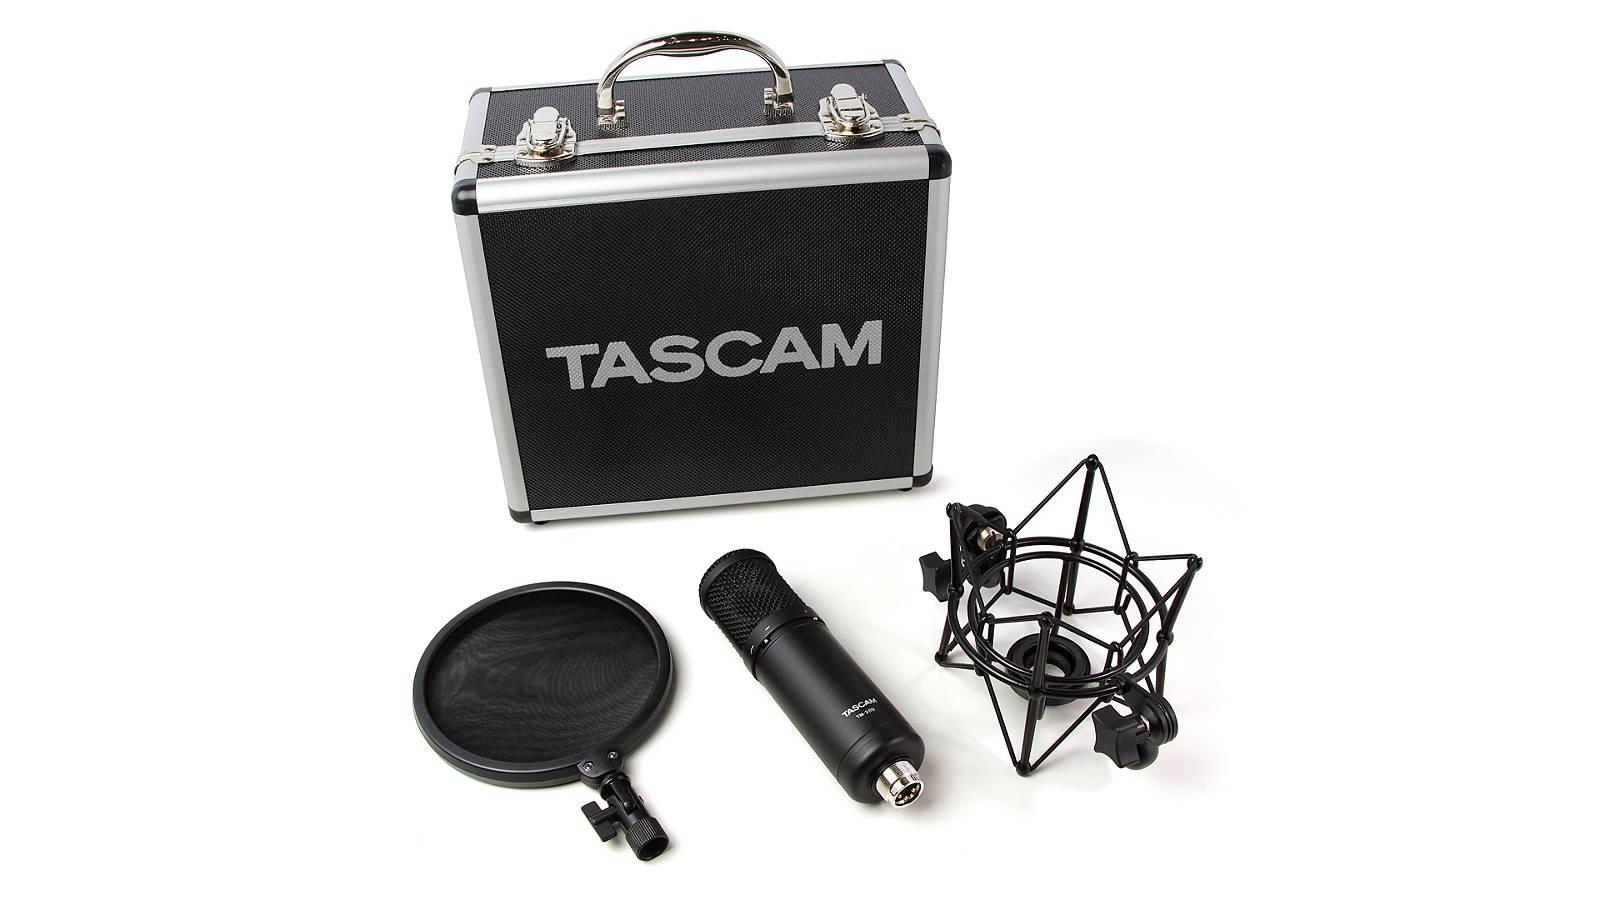 Tascam TM-280 Großmembran Kondensatormikrofon